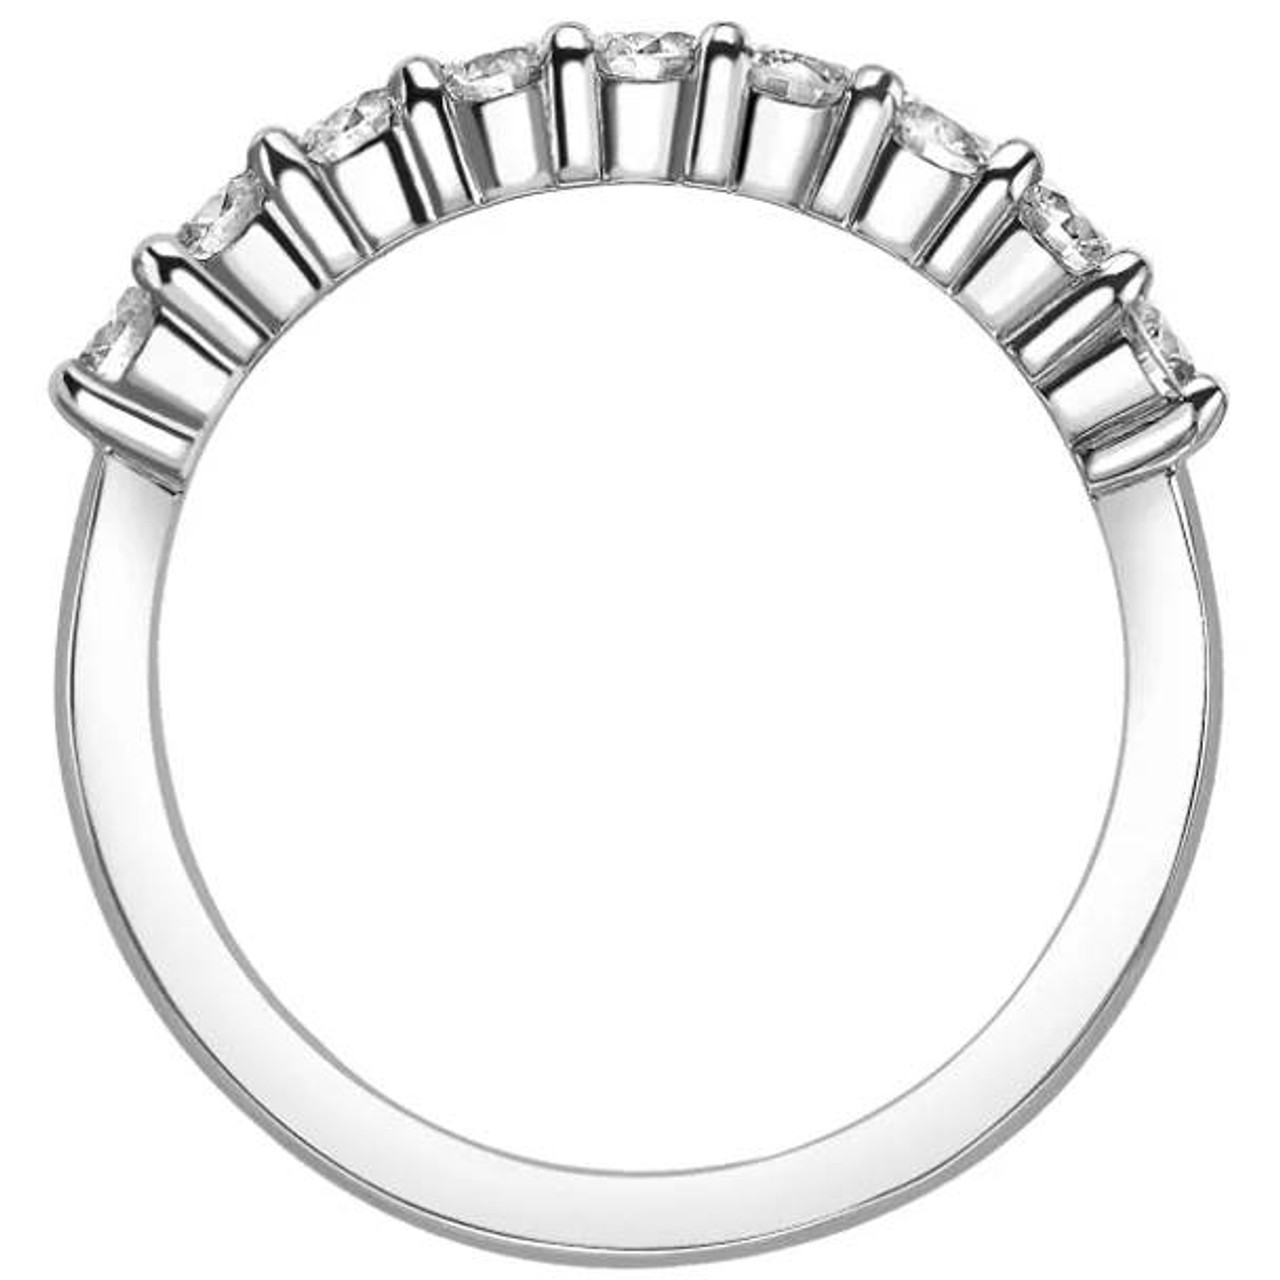 Solid 14K White Gold 1 Ct Half Eternity Wedding Band Excellent Round Cut Diamond